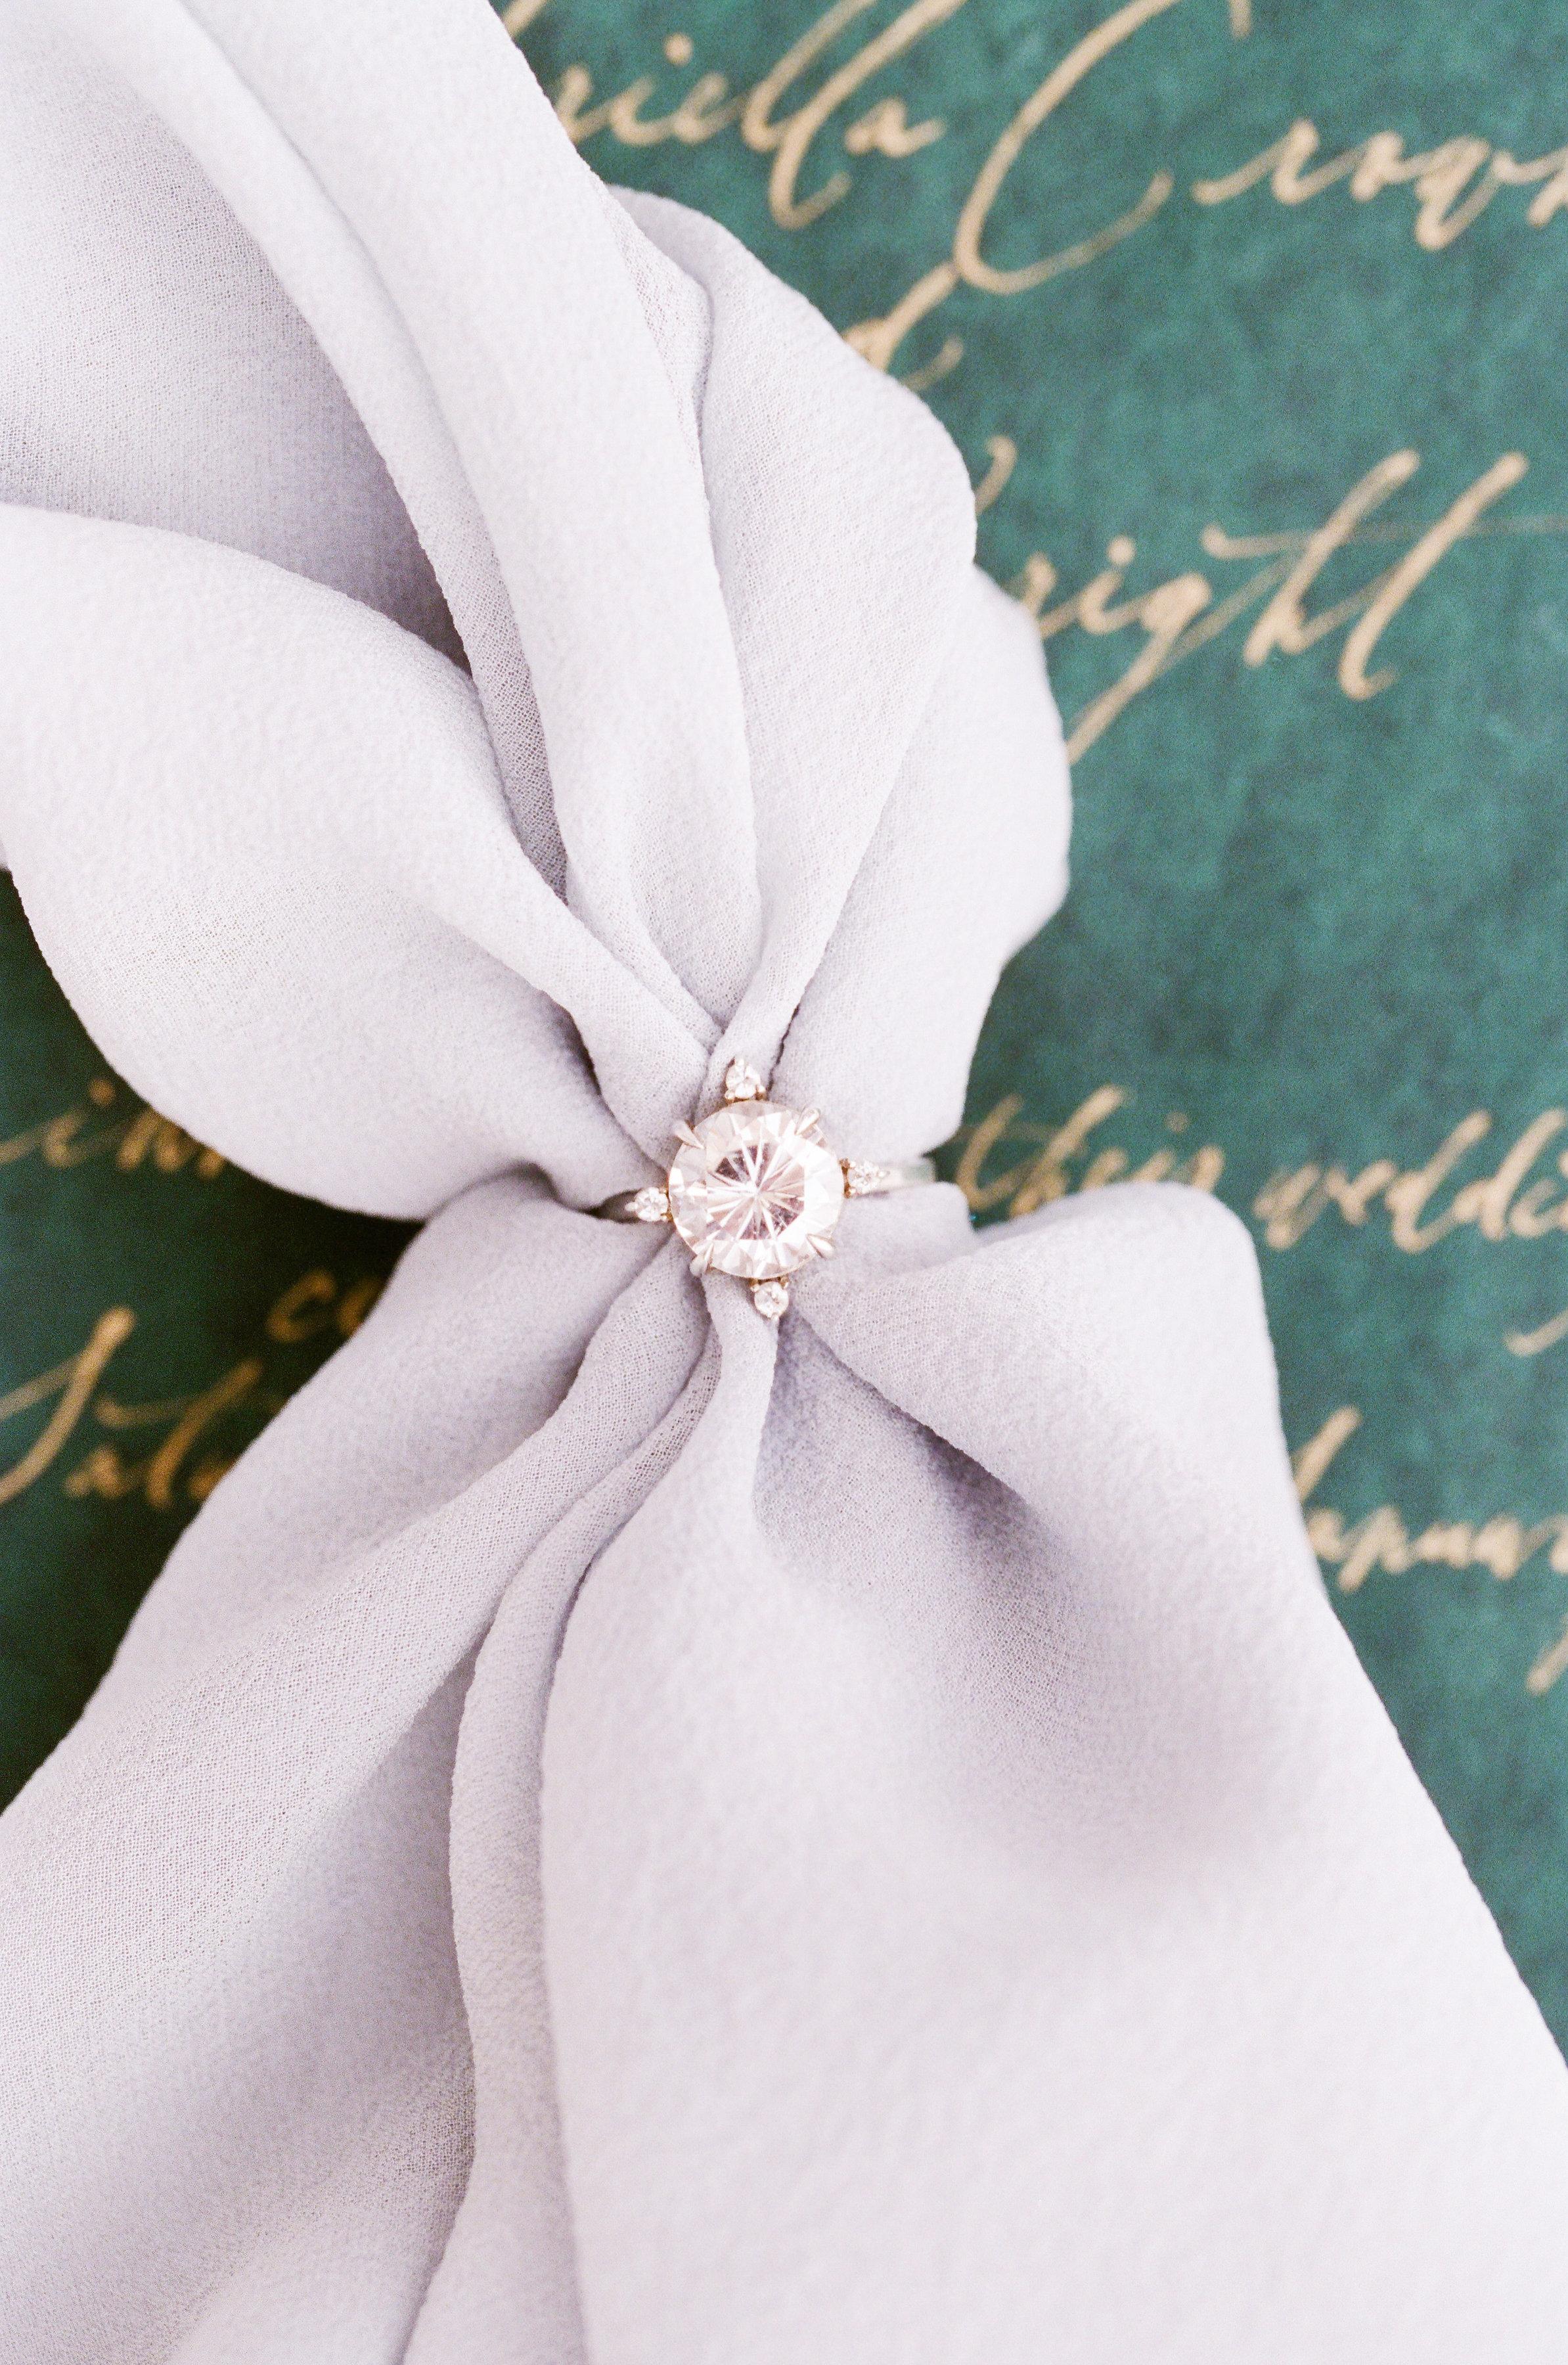 LeVie Wedding - Weddings by Susan Dunne